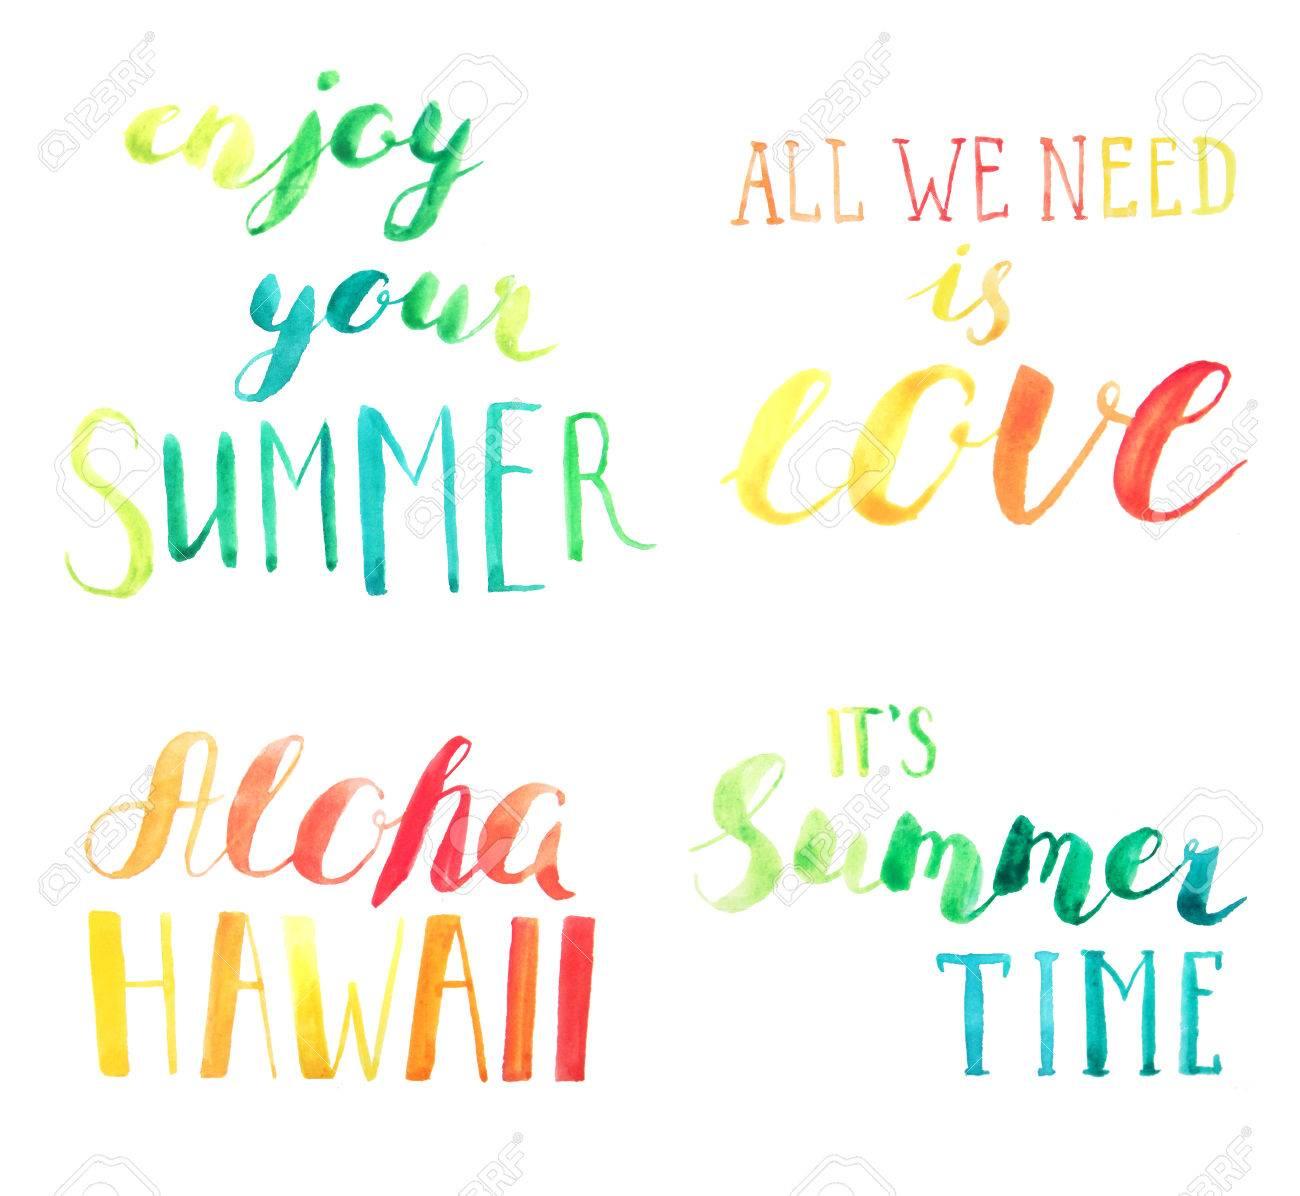 it s summer time enjoy your summer aloha hawaii all we need